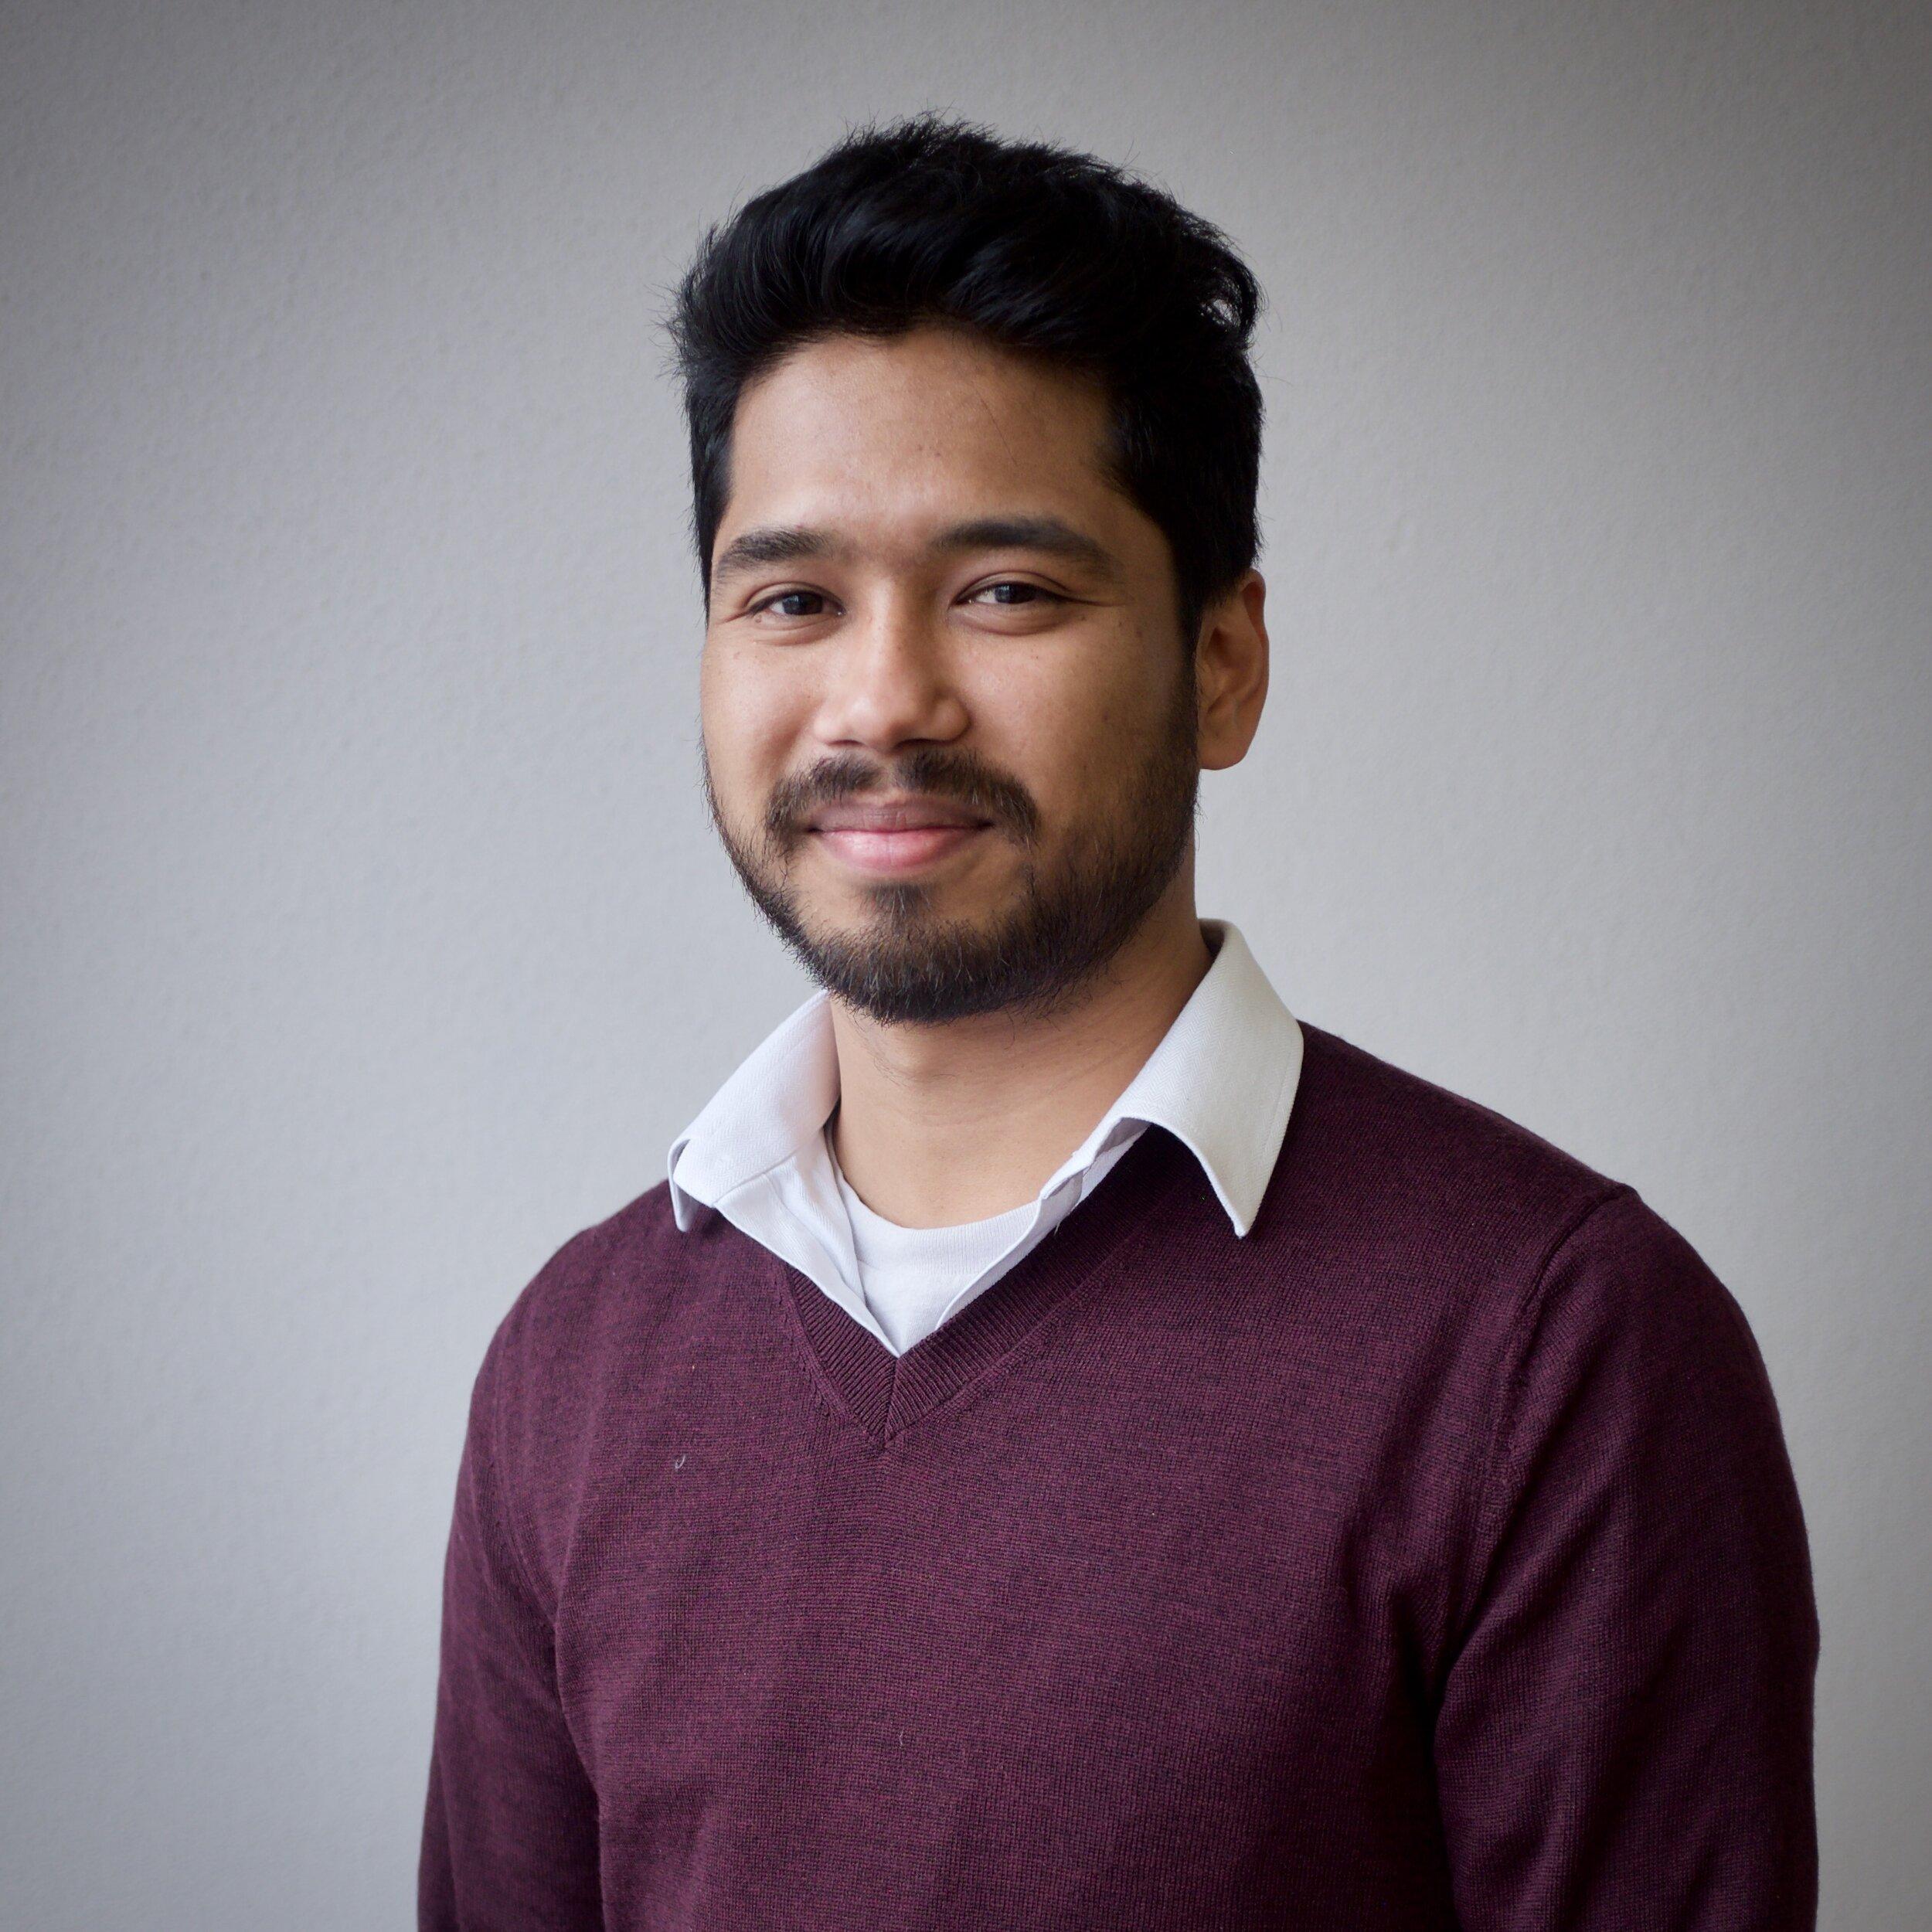 Anup Shrestha, Engineering